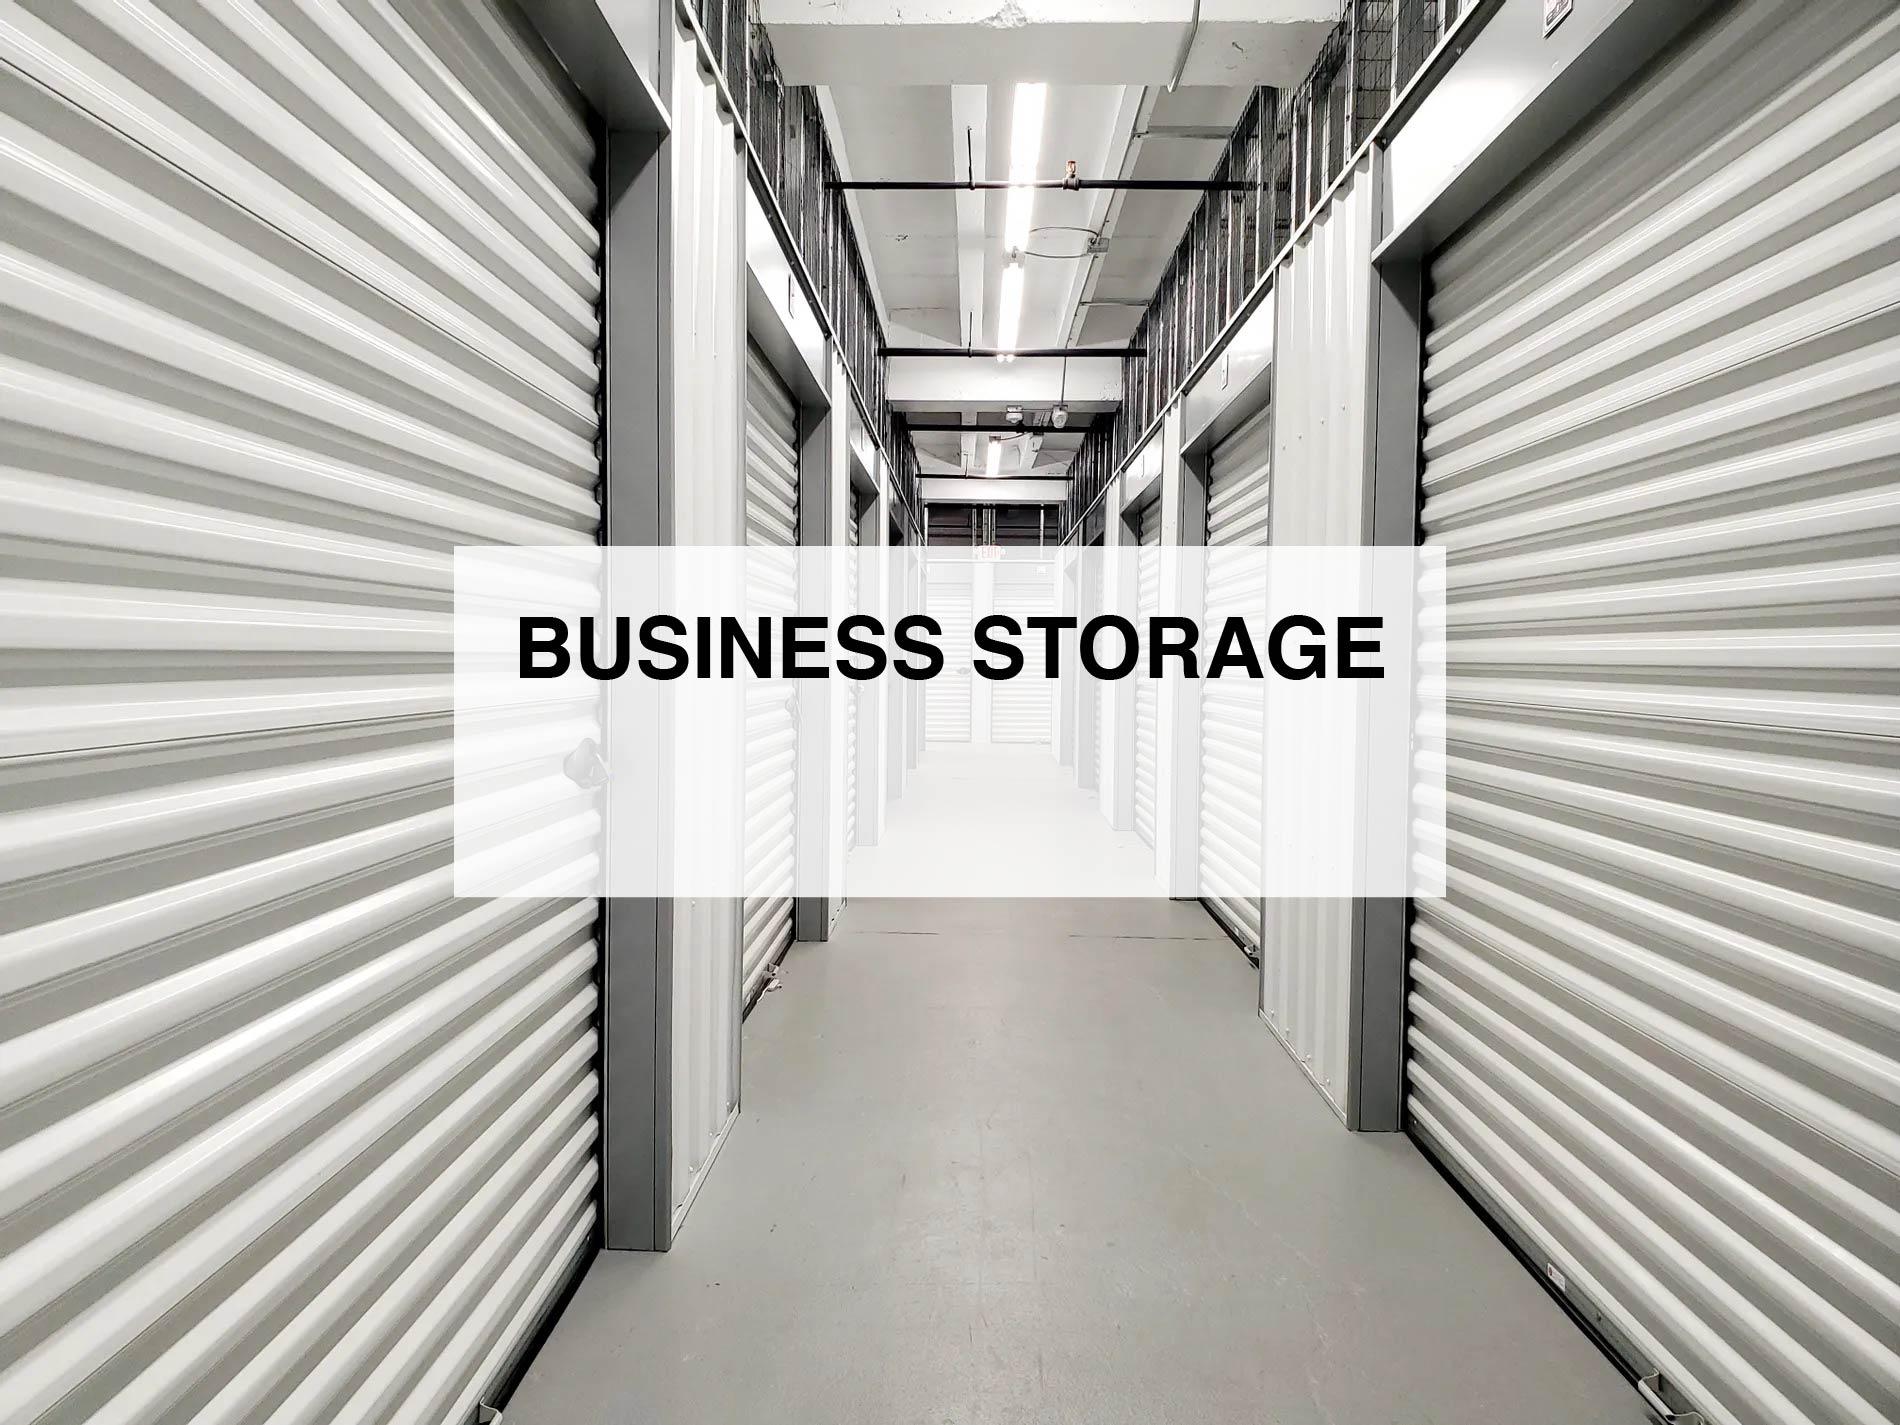 Business Storage Final